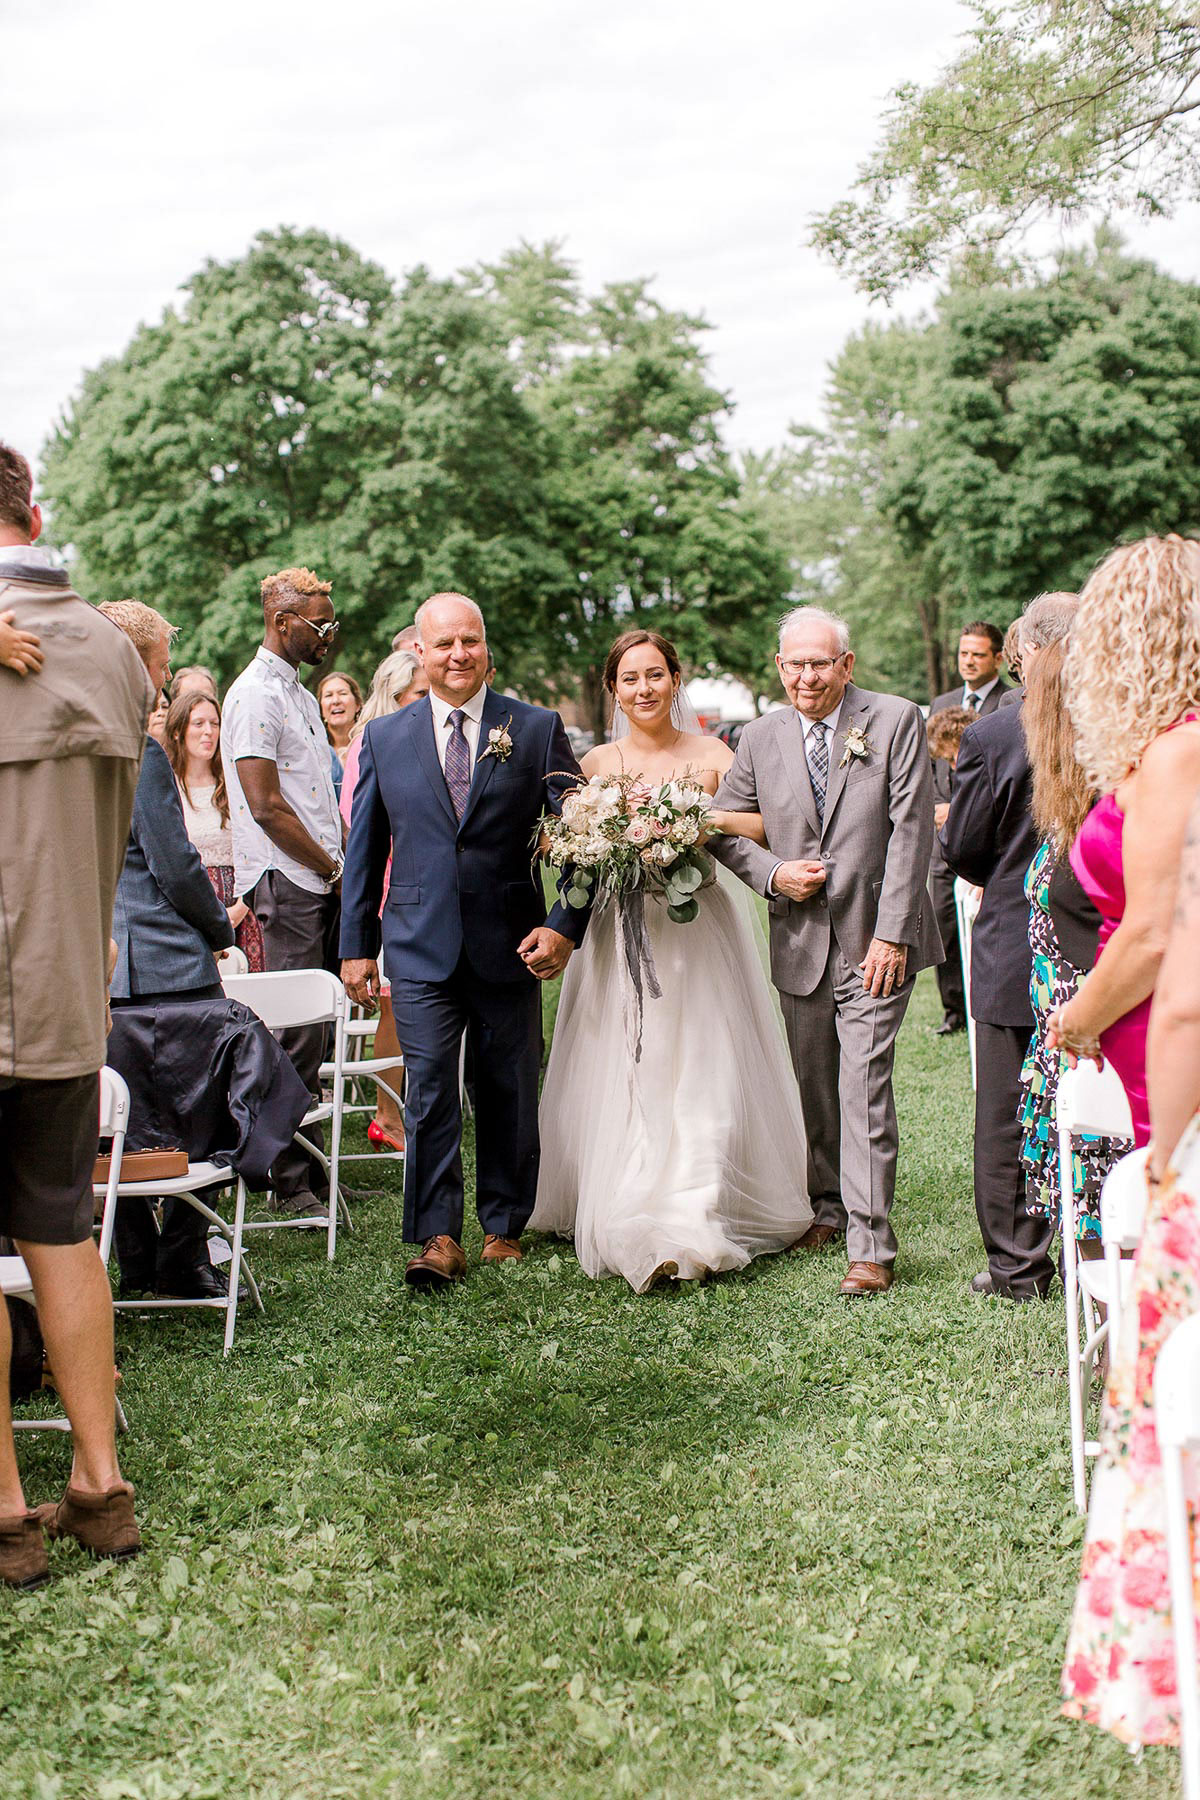 beatrice-elford-photography-vineyard-bride-swish-list-balls-falls-vineland-wedding-47.jpg